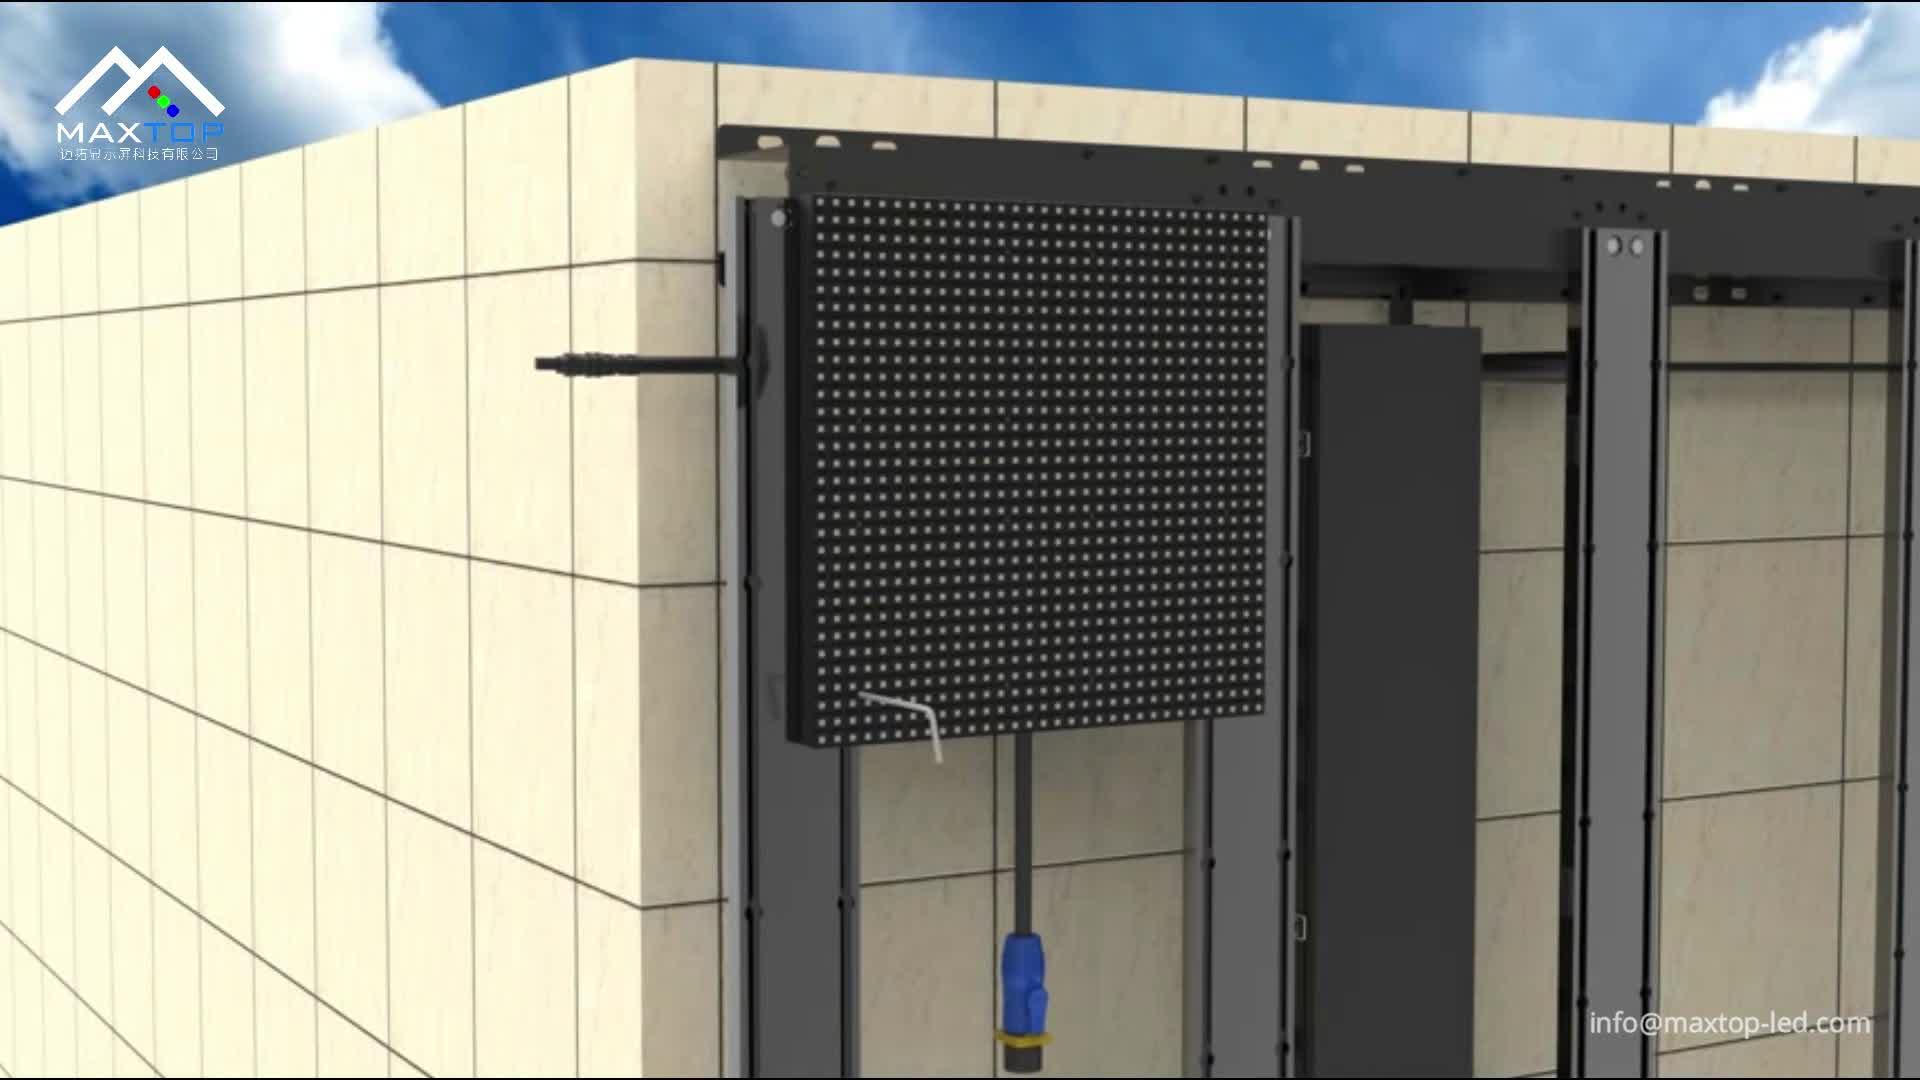 Riesigen Kommerziellen Wasserdicht Platten Video Outdoor LED Werbung Billboard